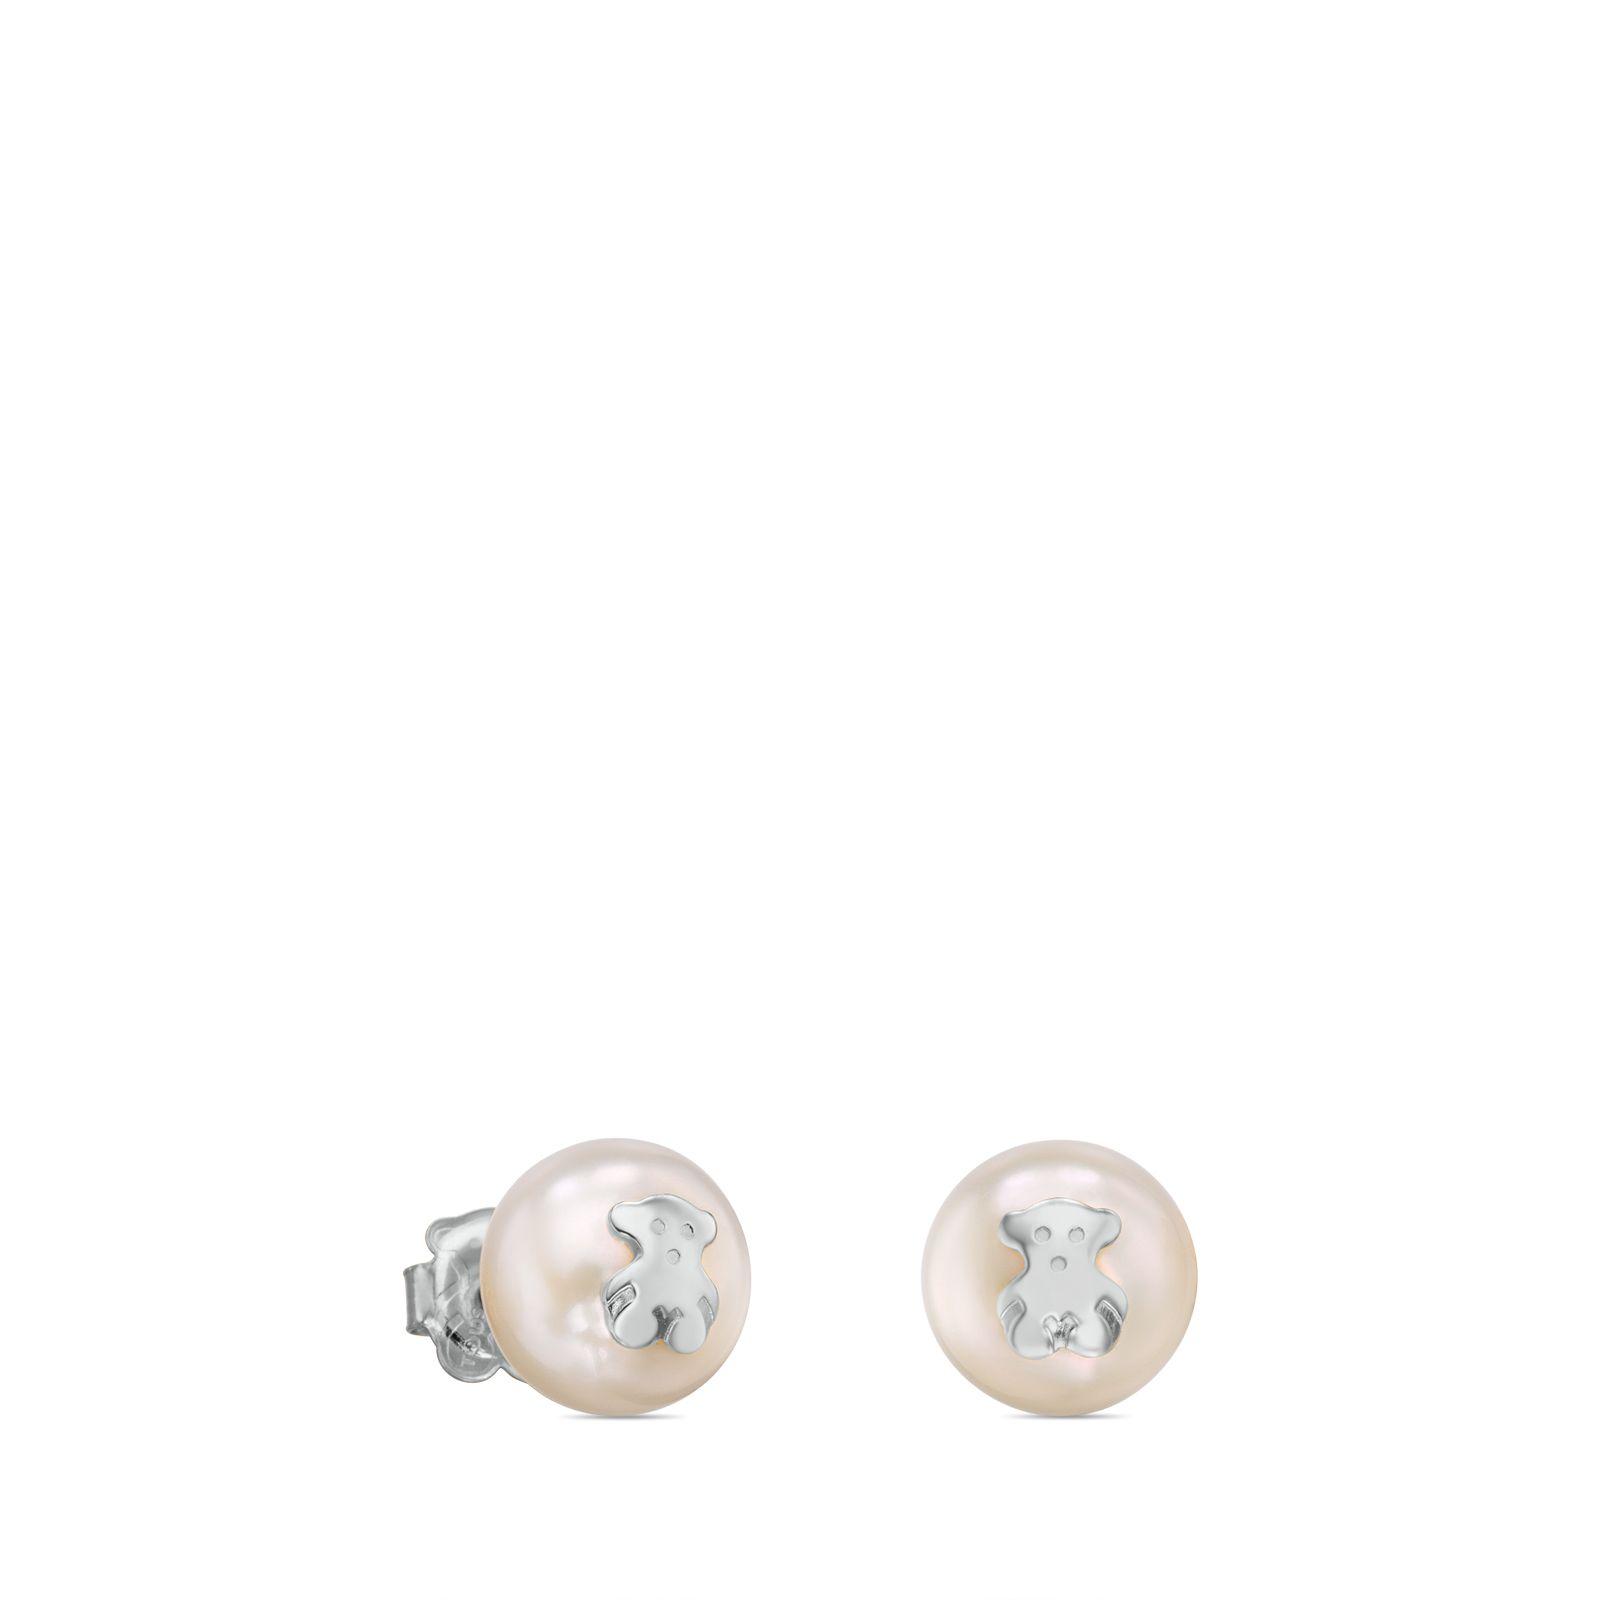 Pendientes perlas blancas de tous